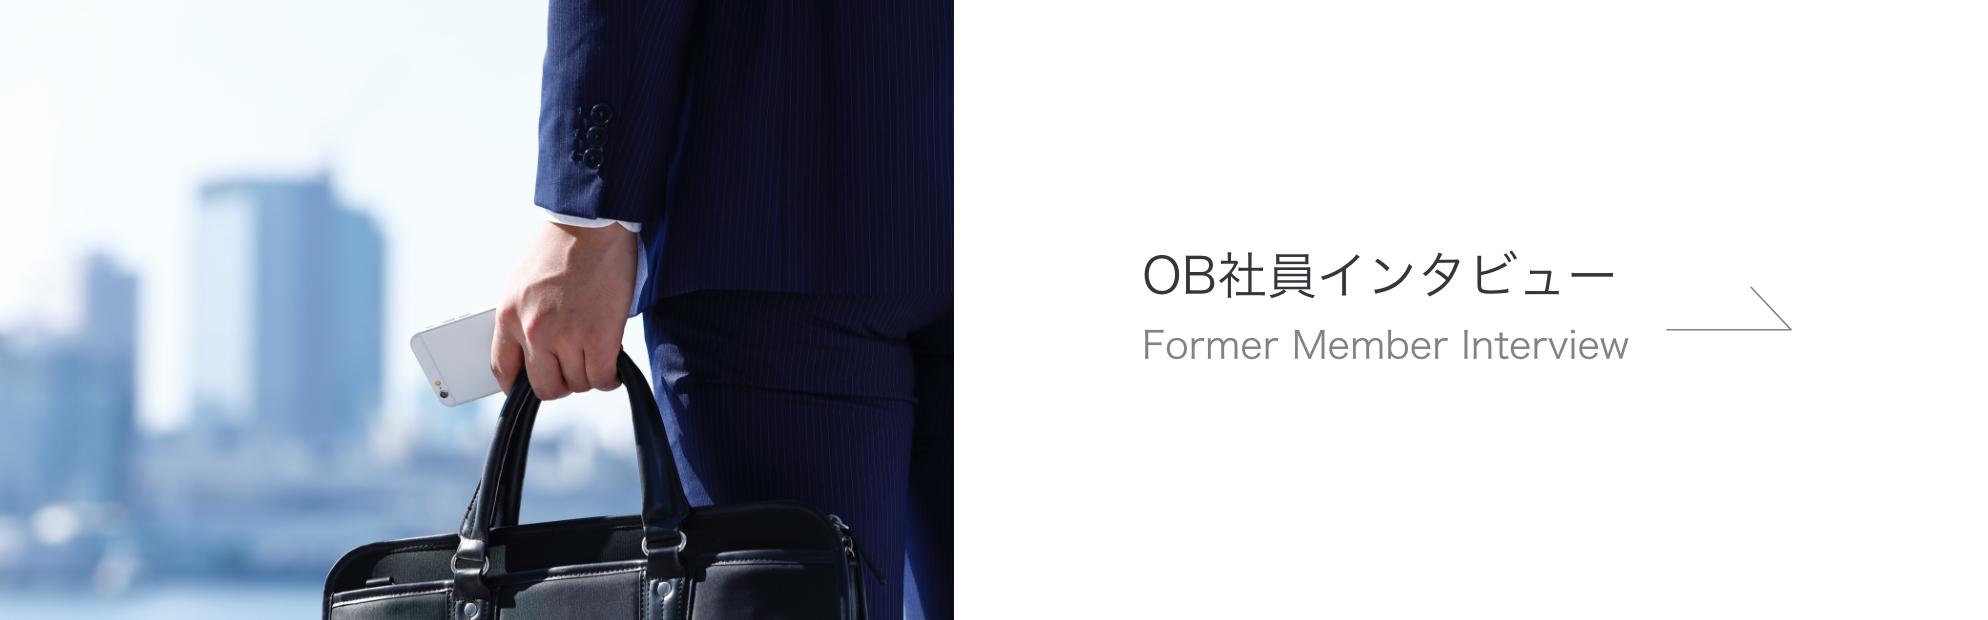 OB社員インタビュー